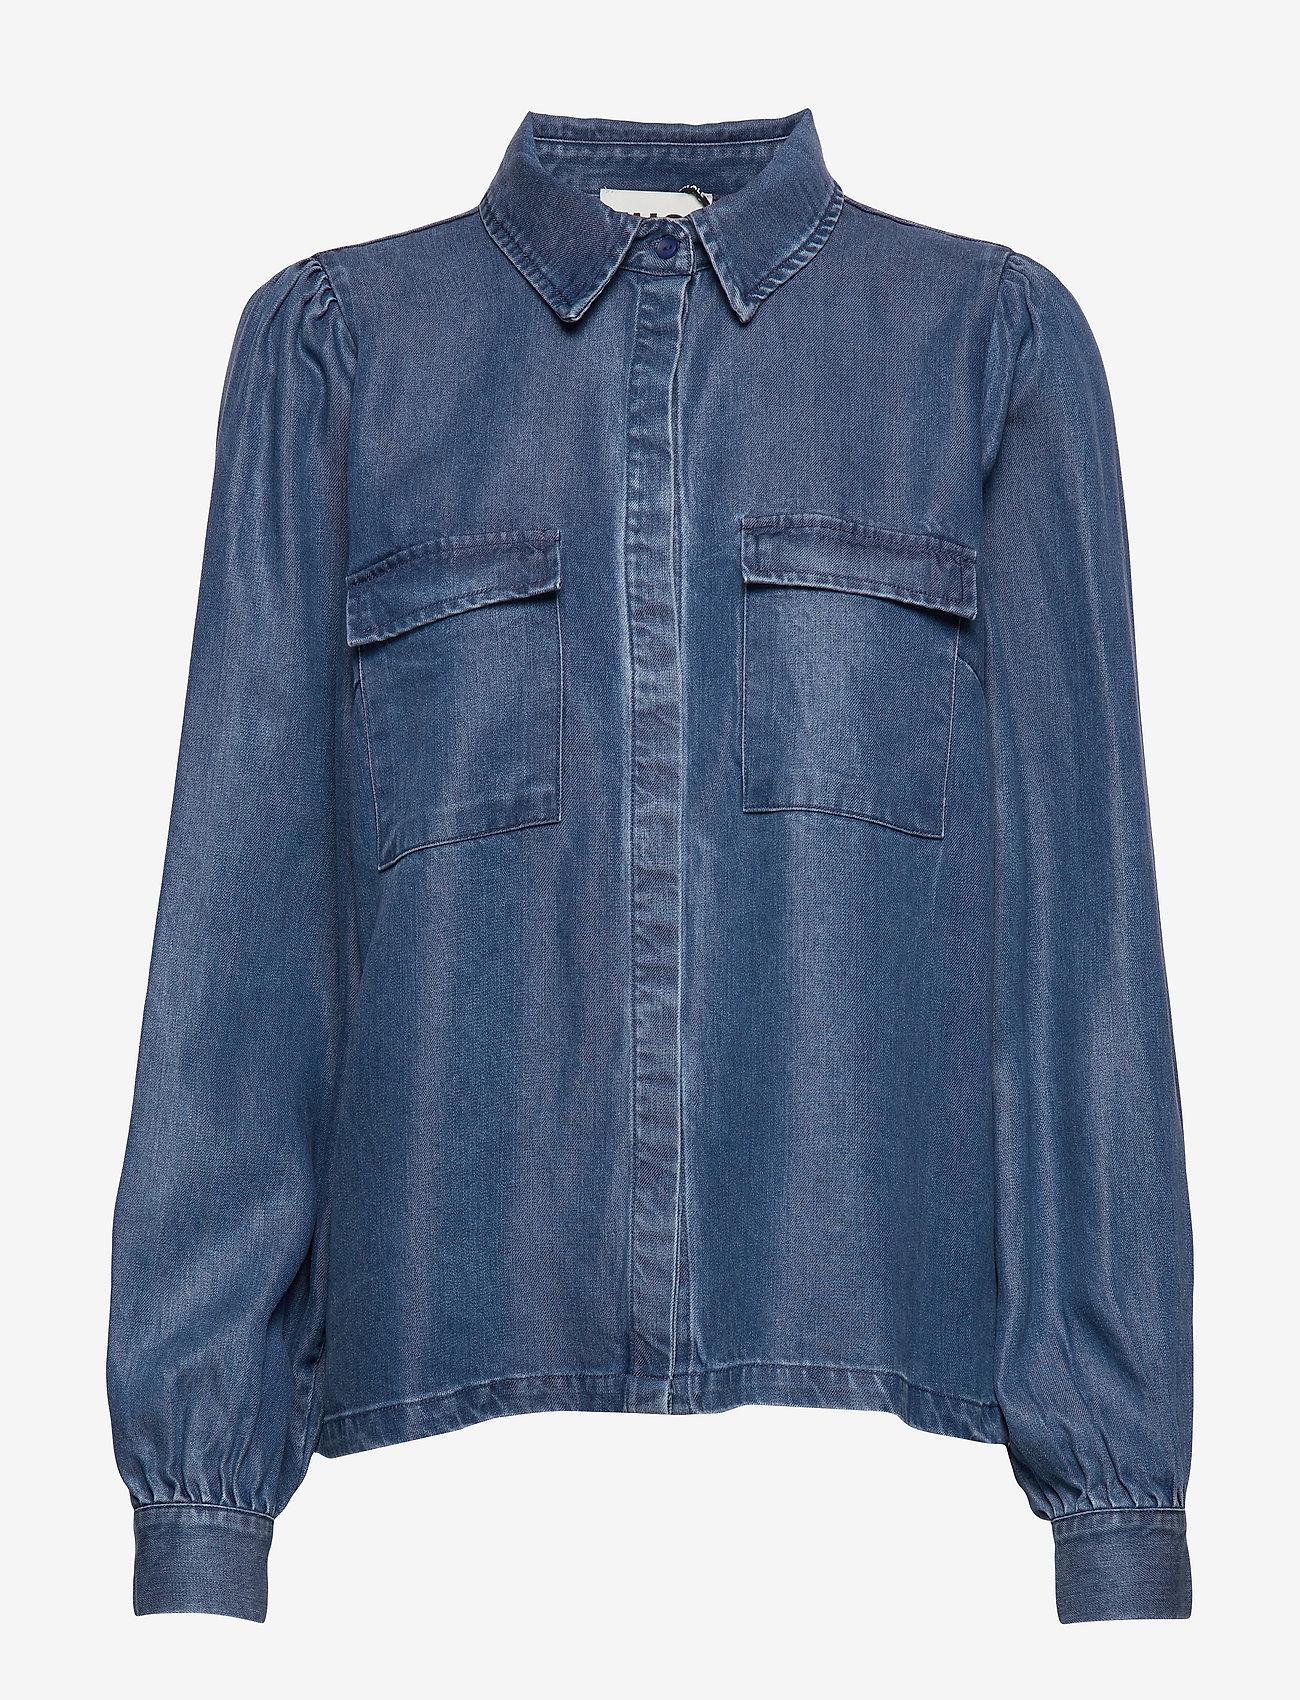 Cas Shirt (Dark Blue Denim) - Just Female i2upfr